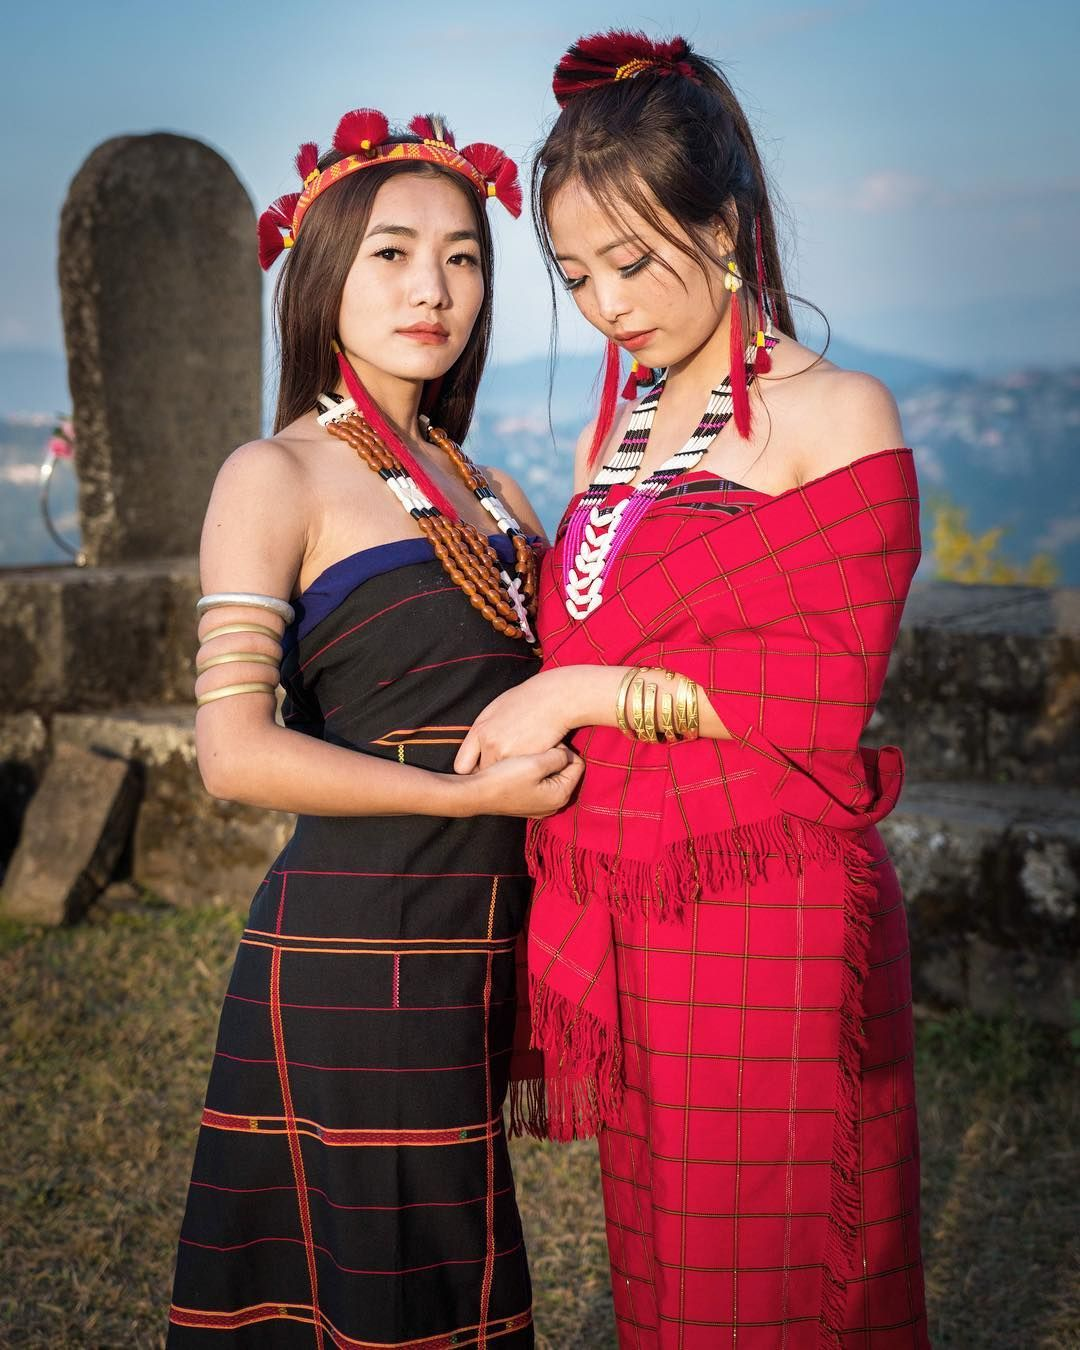 Girls naga hot Hot Naga